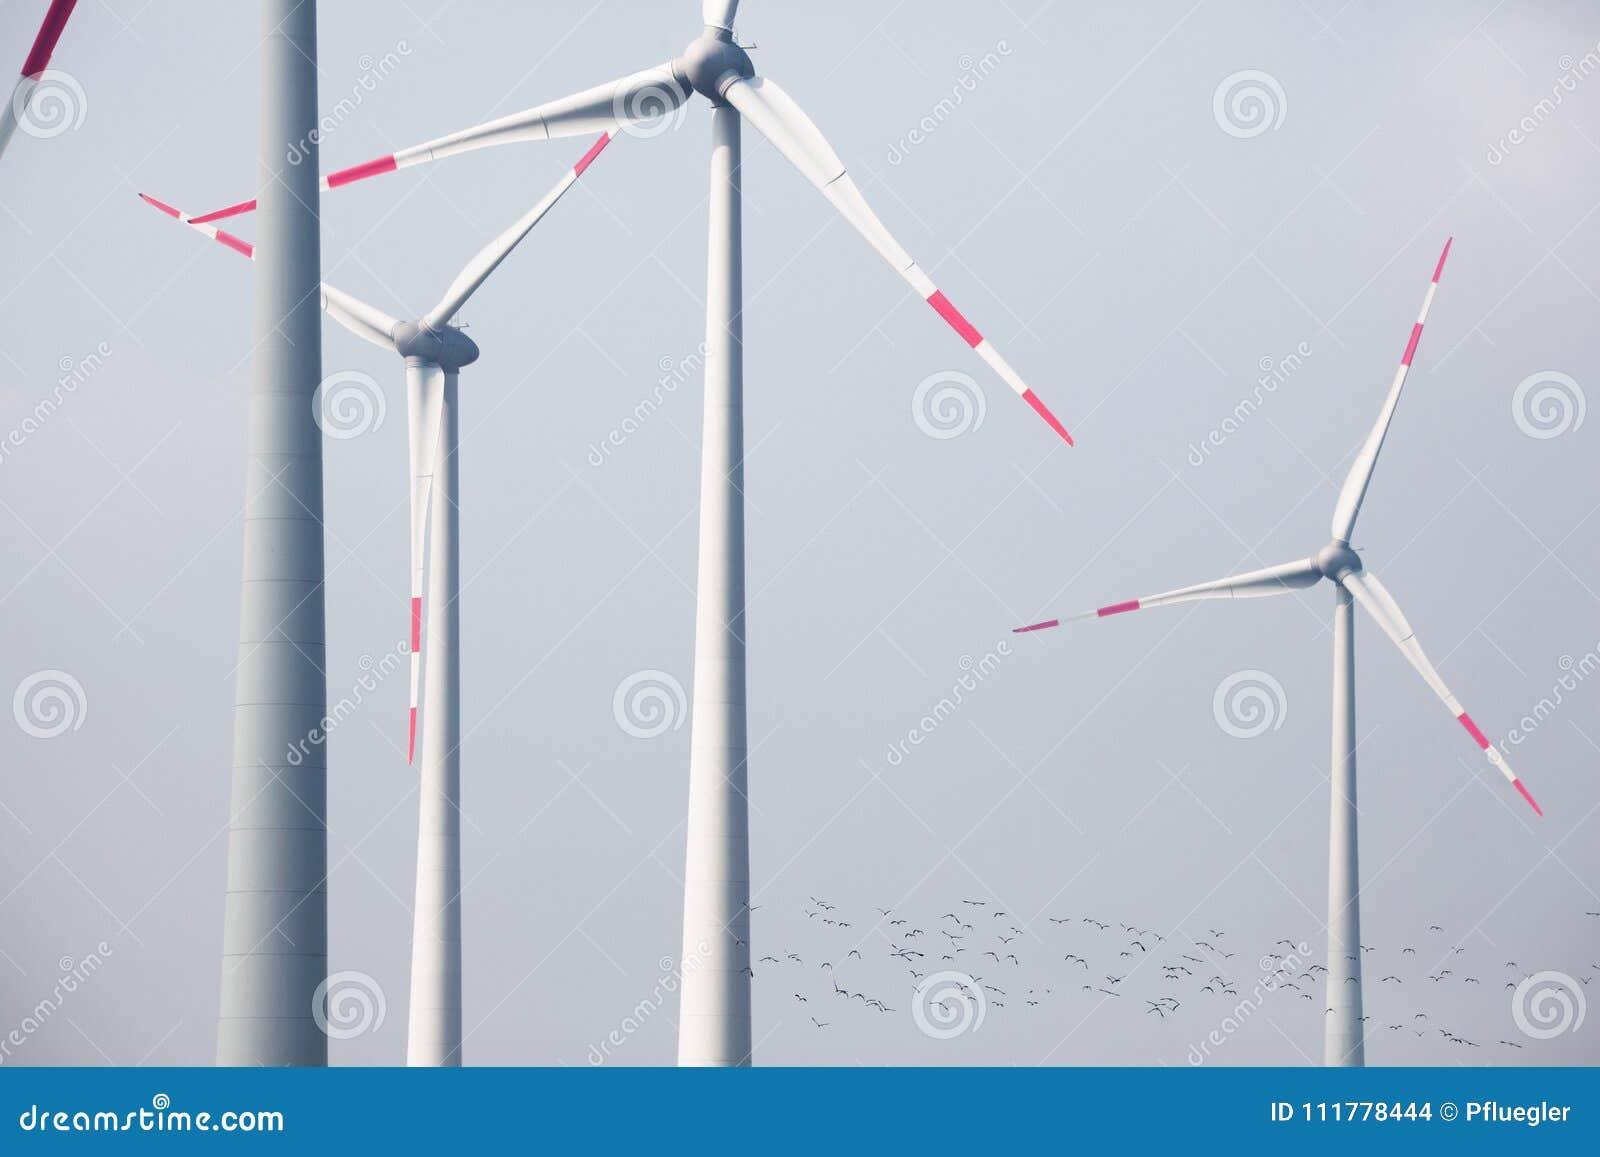 Big wind turbines